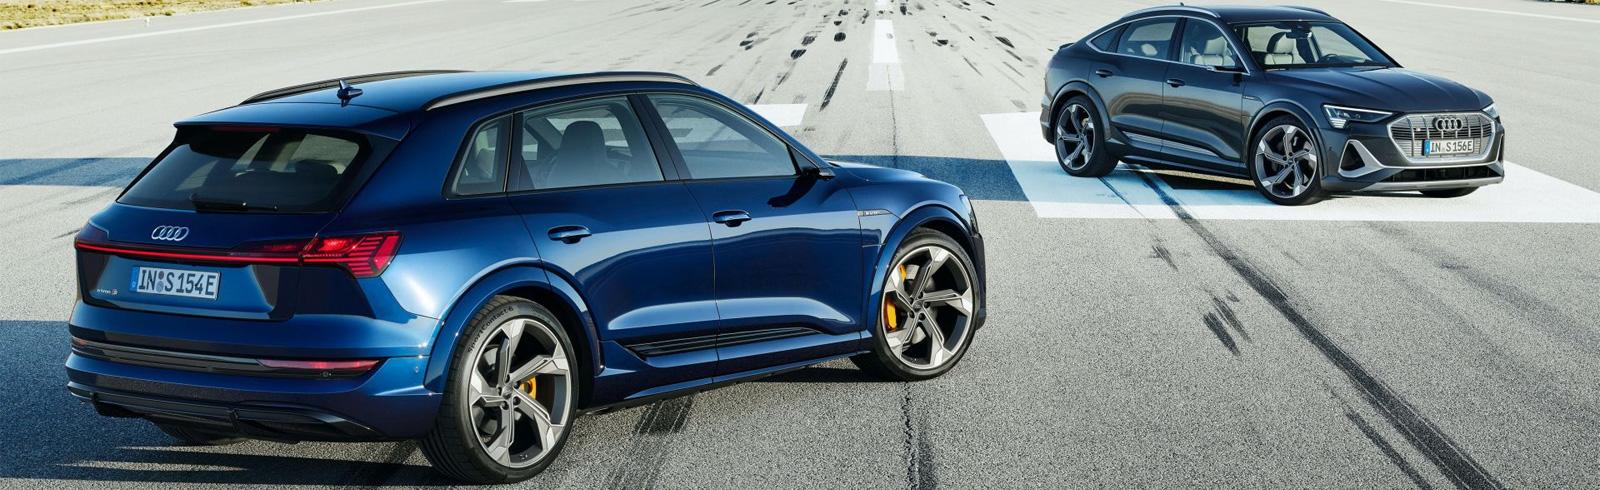 2021 Audi e-tron S And e-tron S Sportback are officially announced